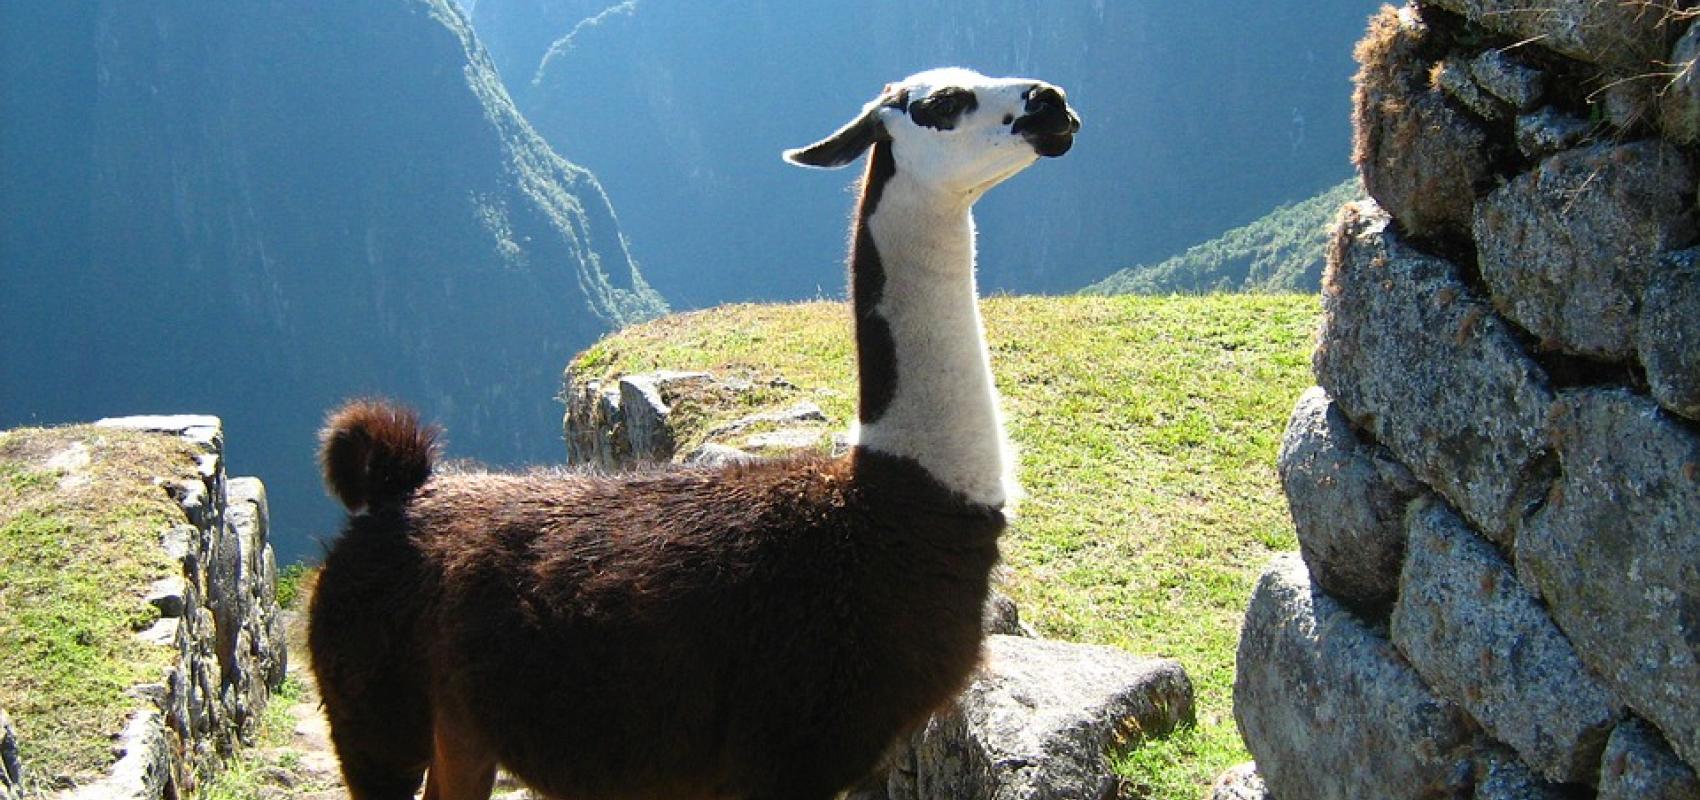 Llama in Cuzco